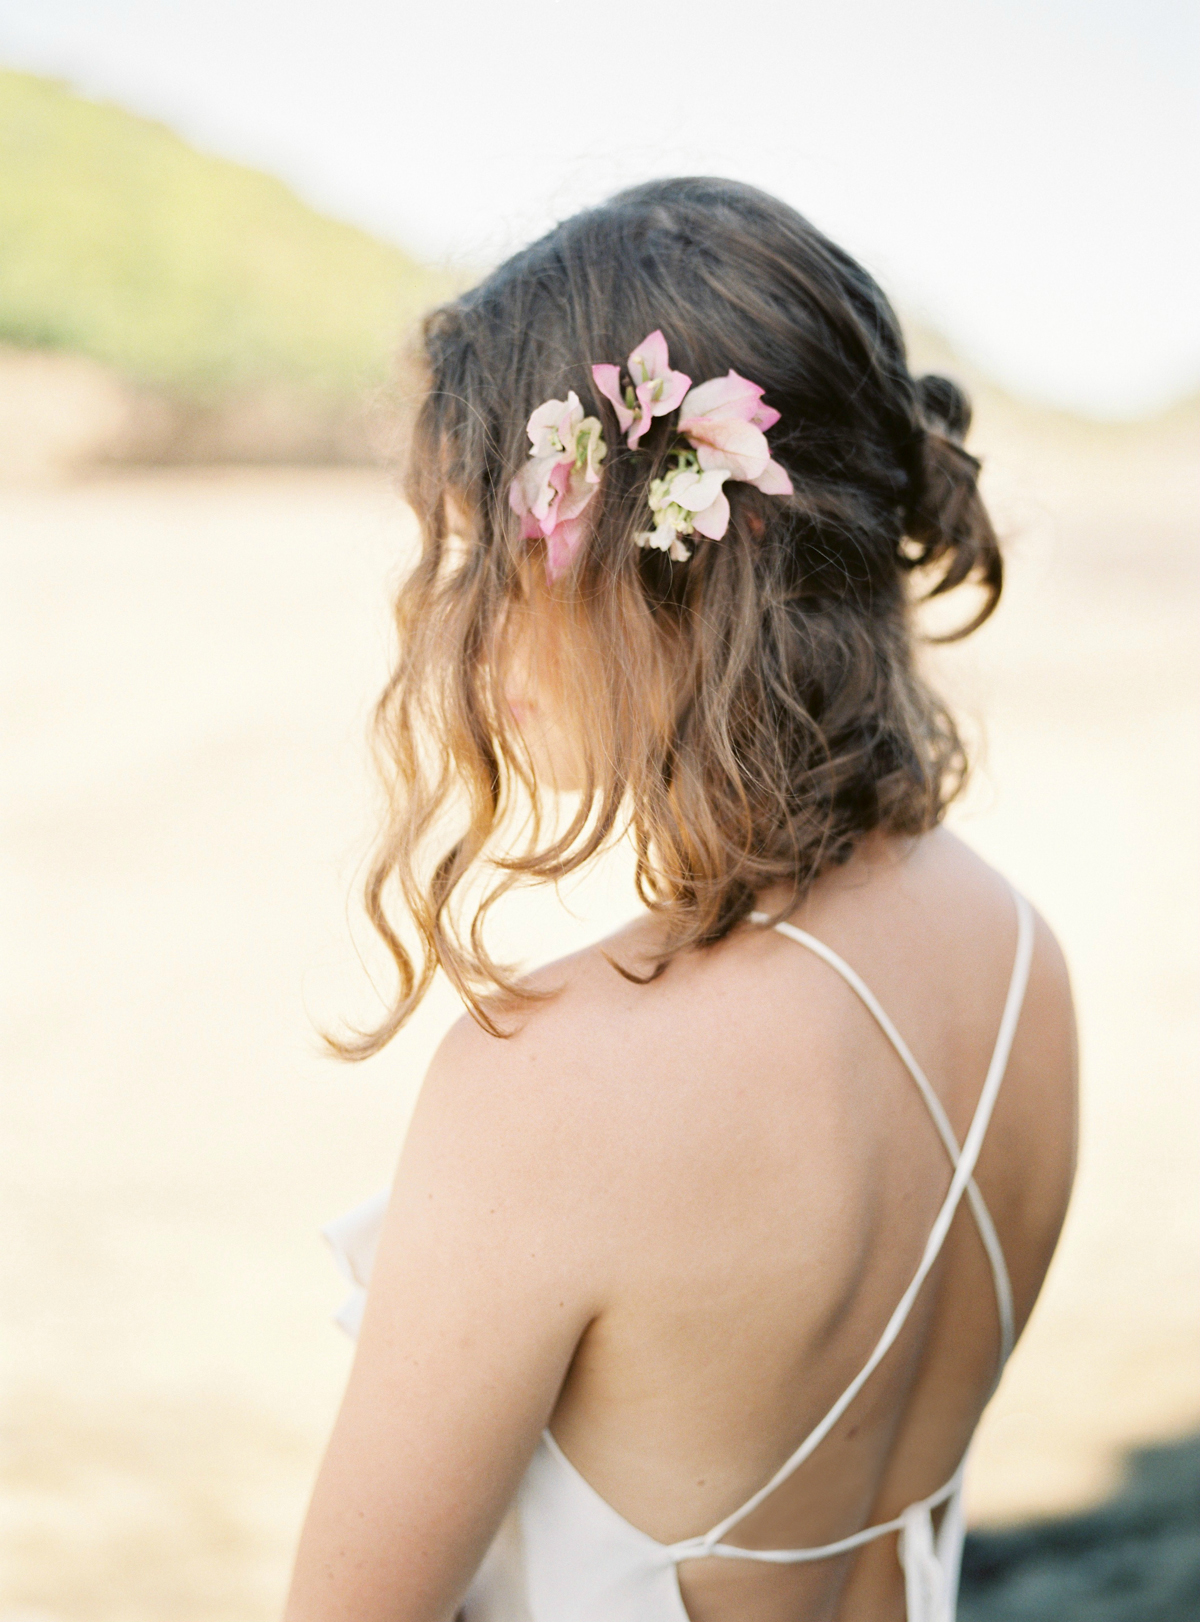 Simple organic wedding hair for beach wedding